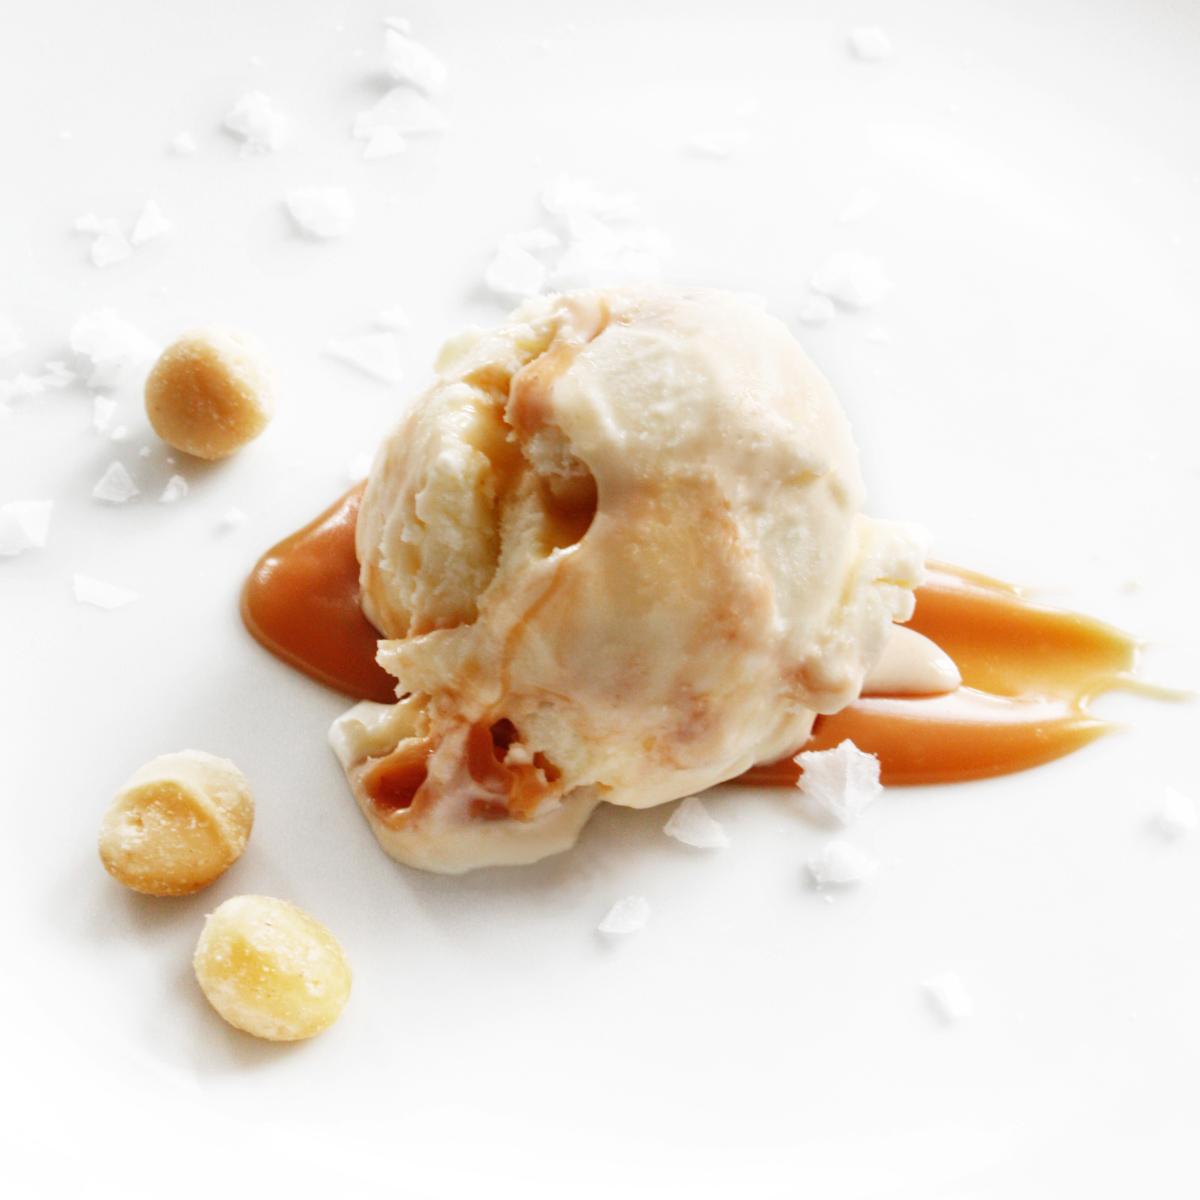 Par Creamery Eisdiele Berlin Prenzlauer Berg-2